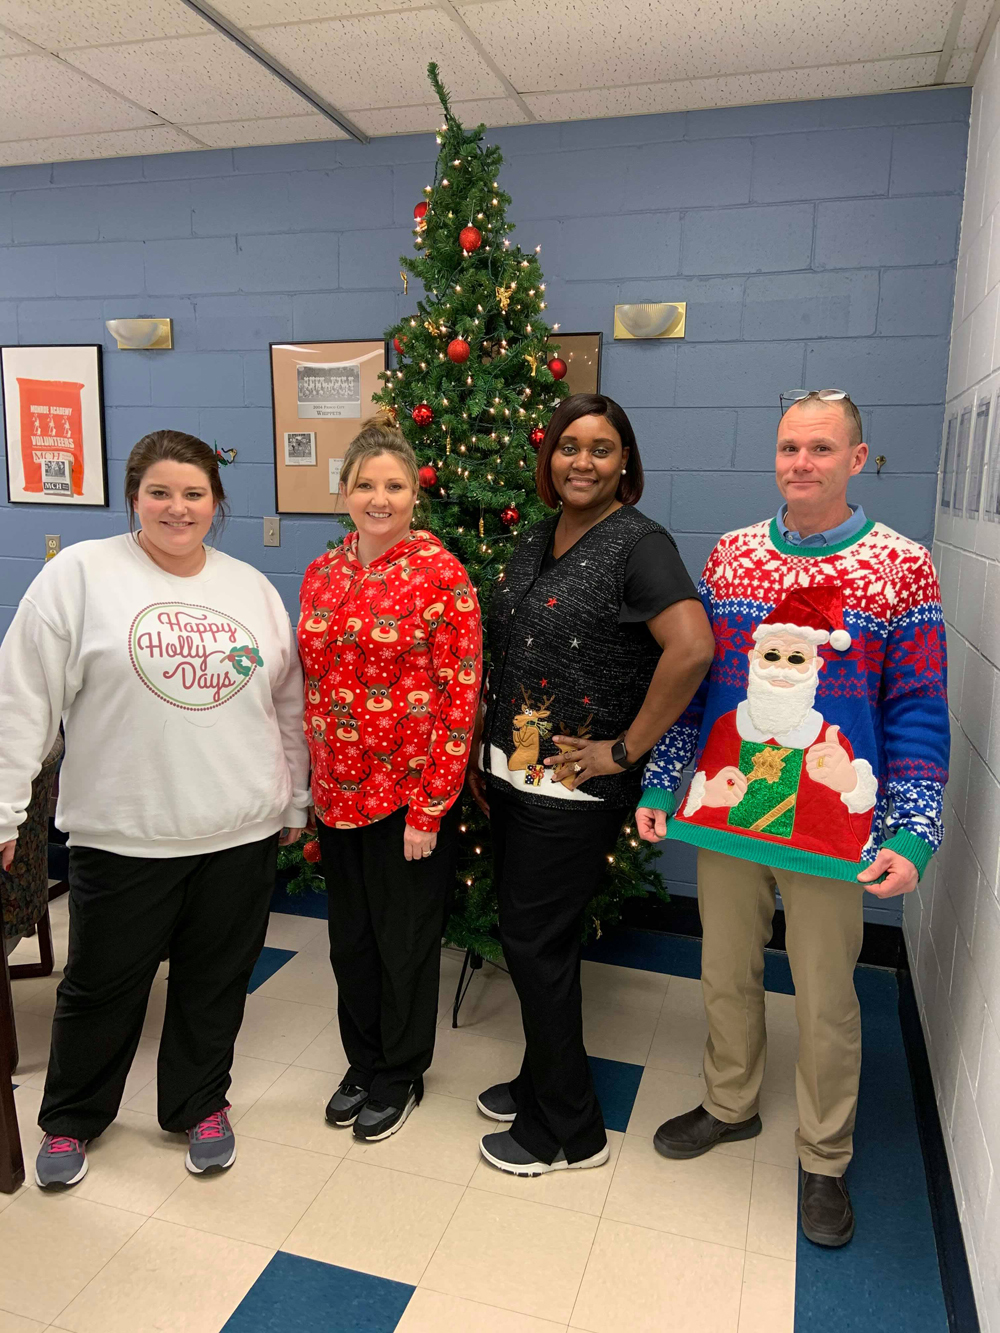 Merry Christmas from #EncoreRehab - Monroeville!